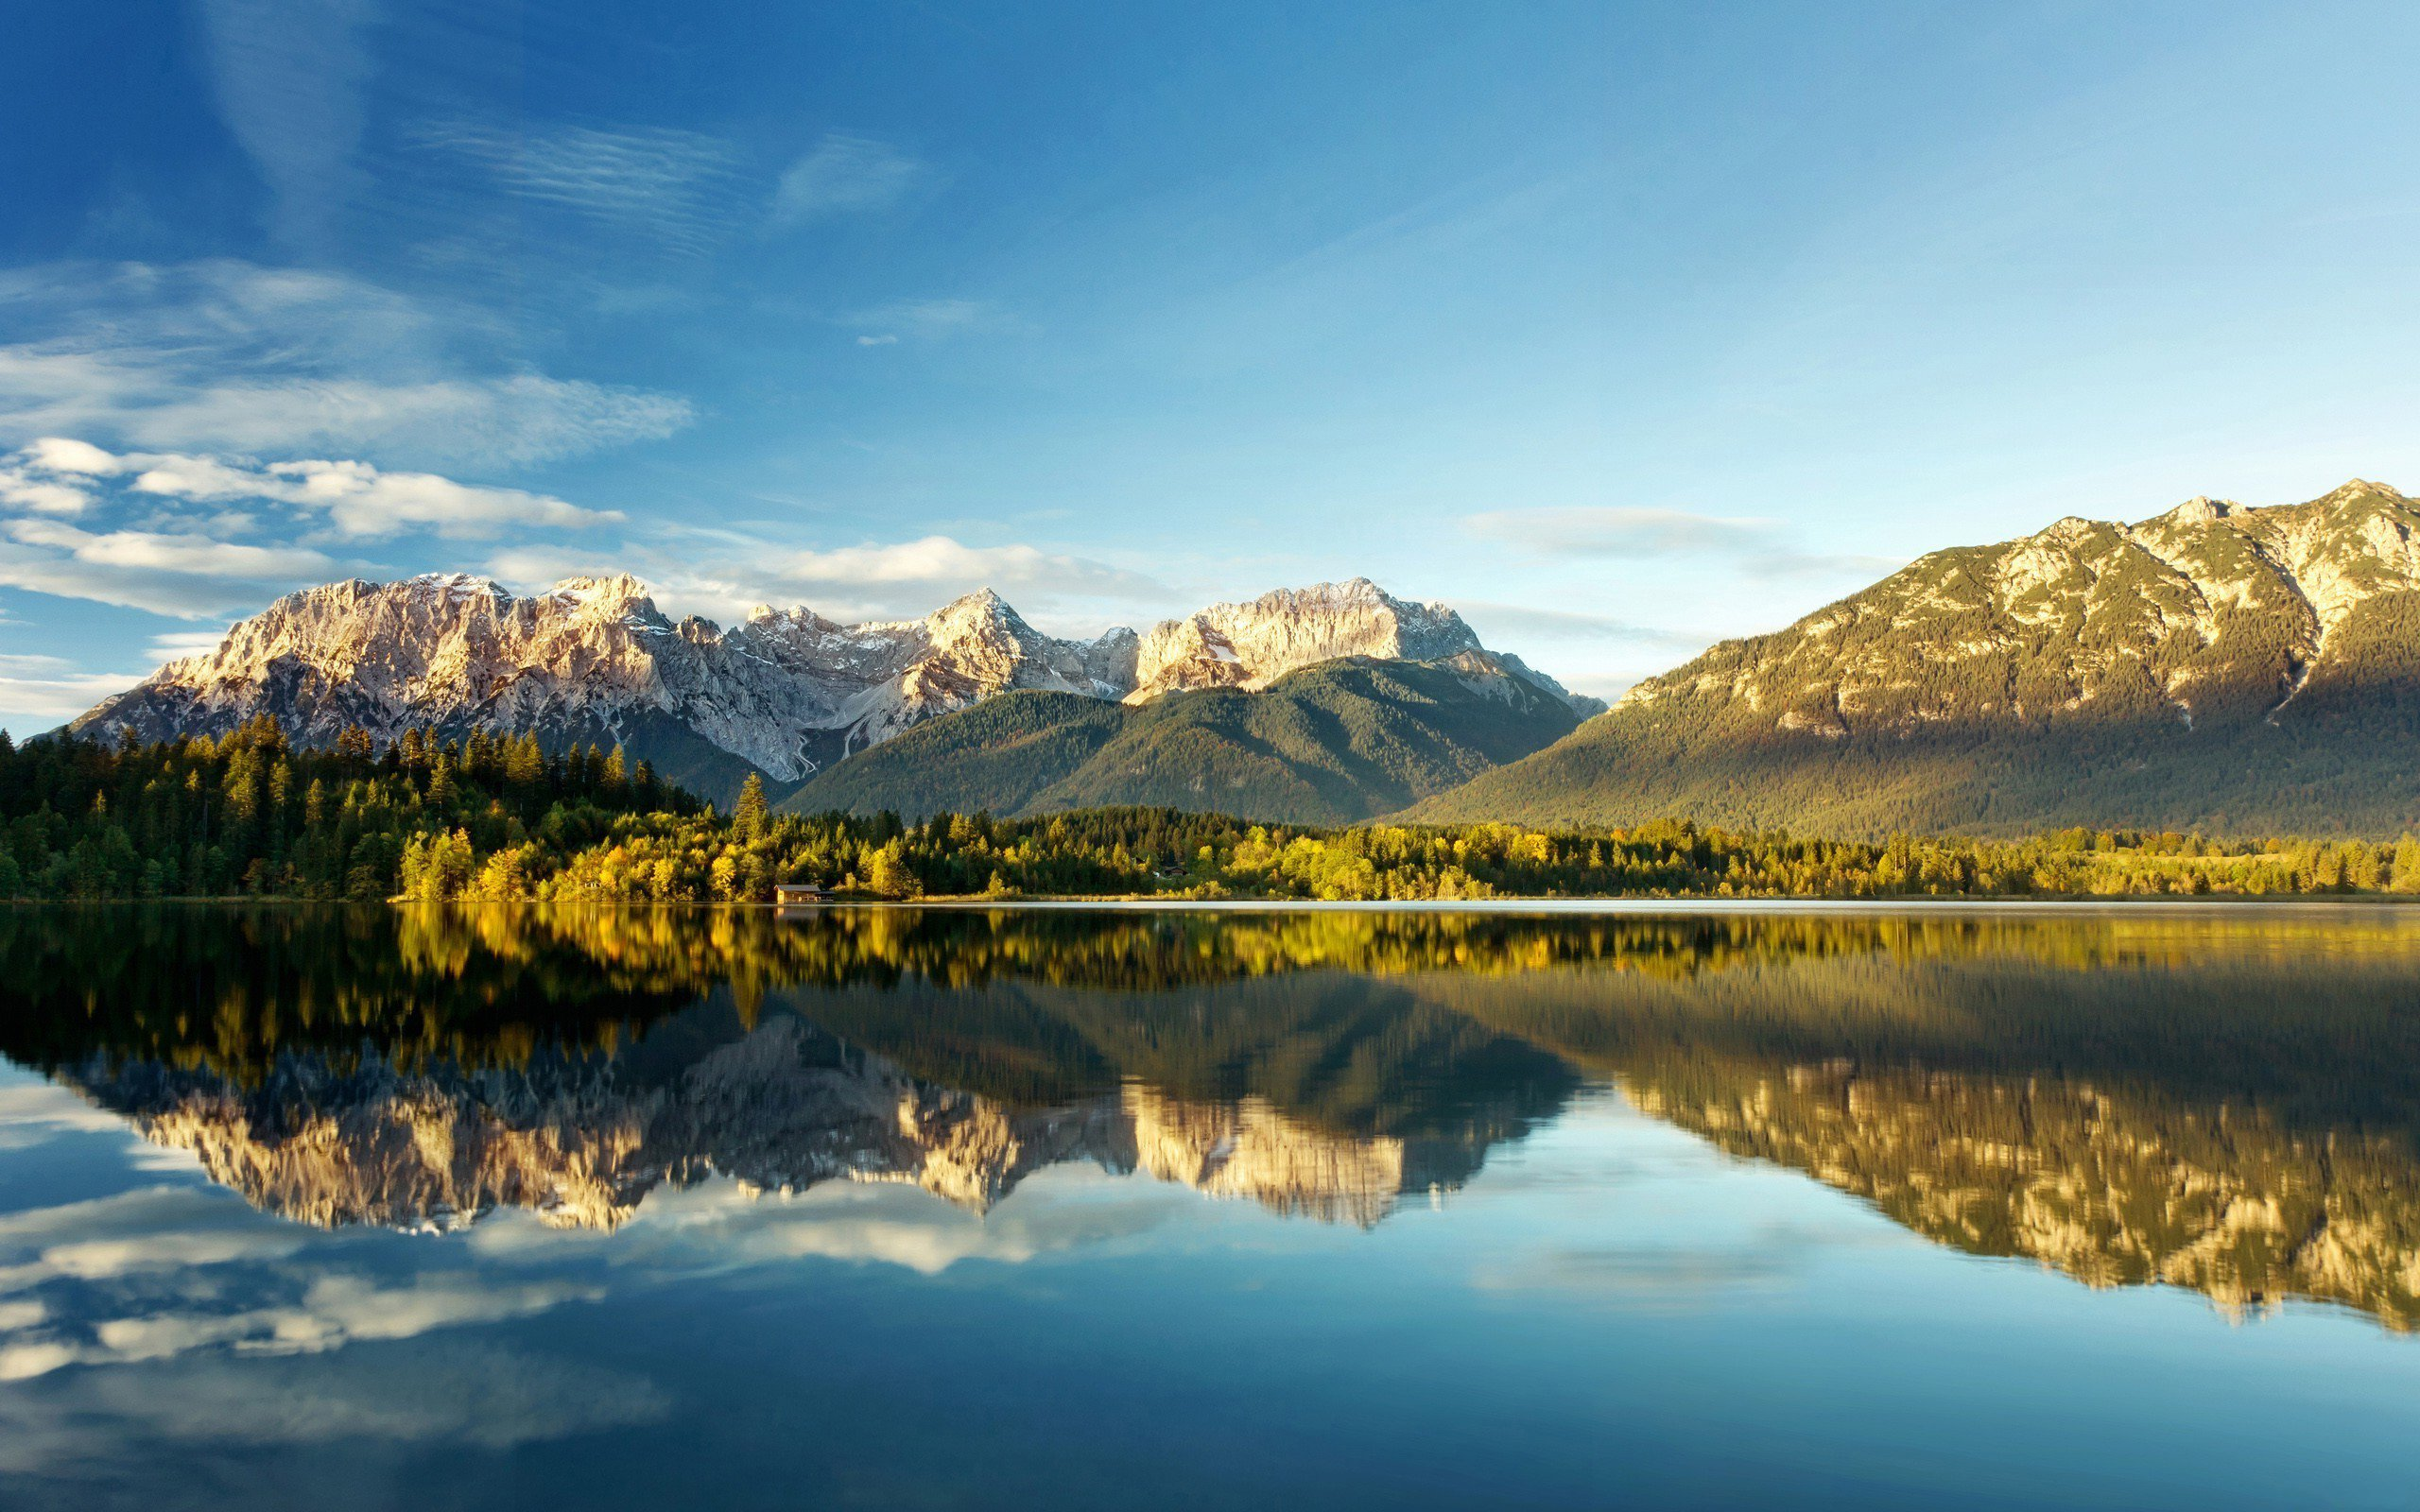 Sky blue clouds nature green lake wallpaper 2560x1600 - Nature wallpaper 2560x1600 ...